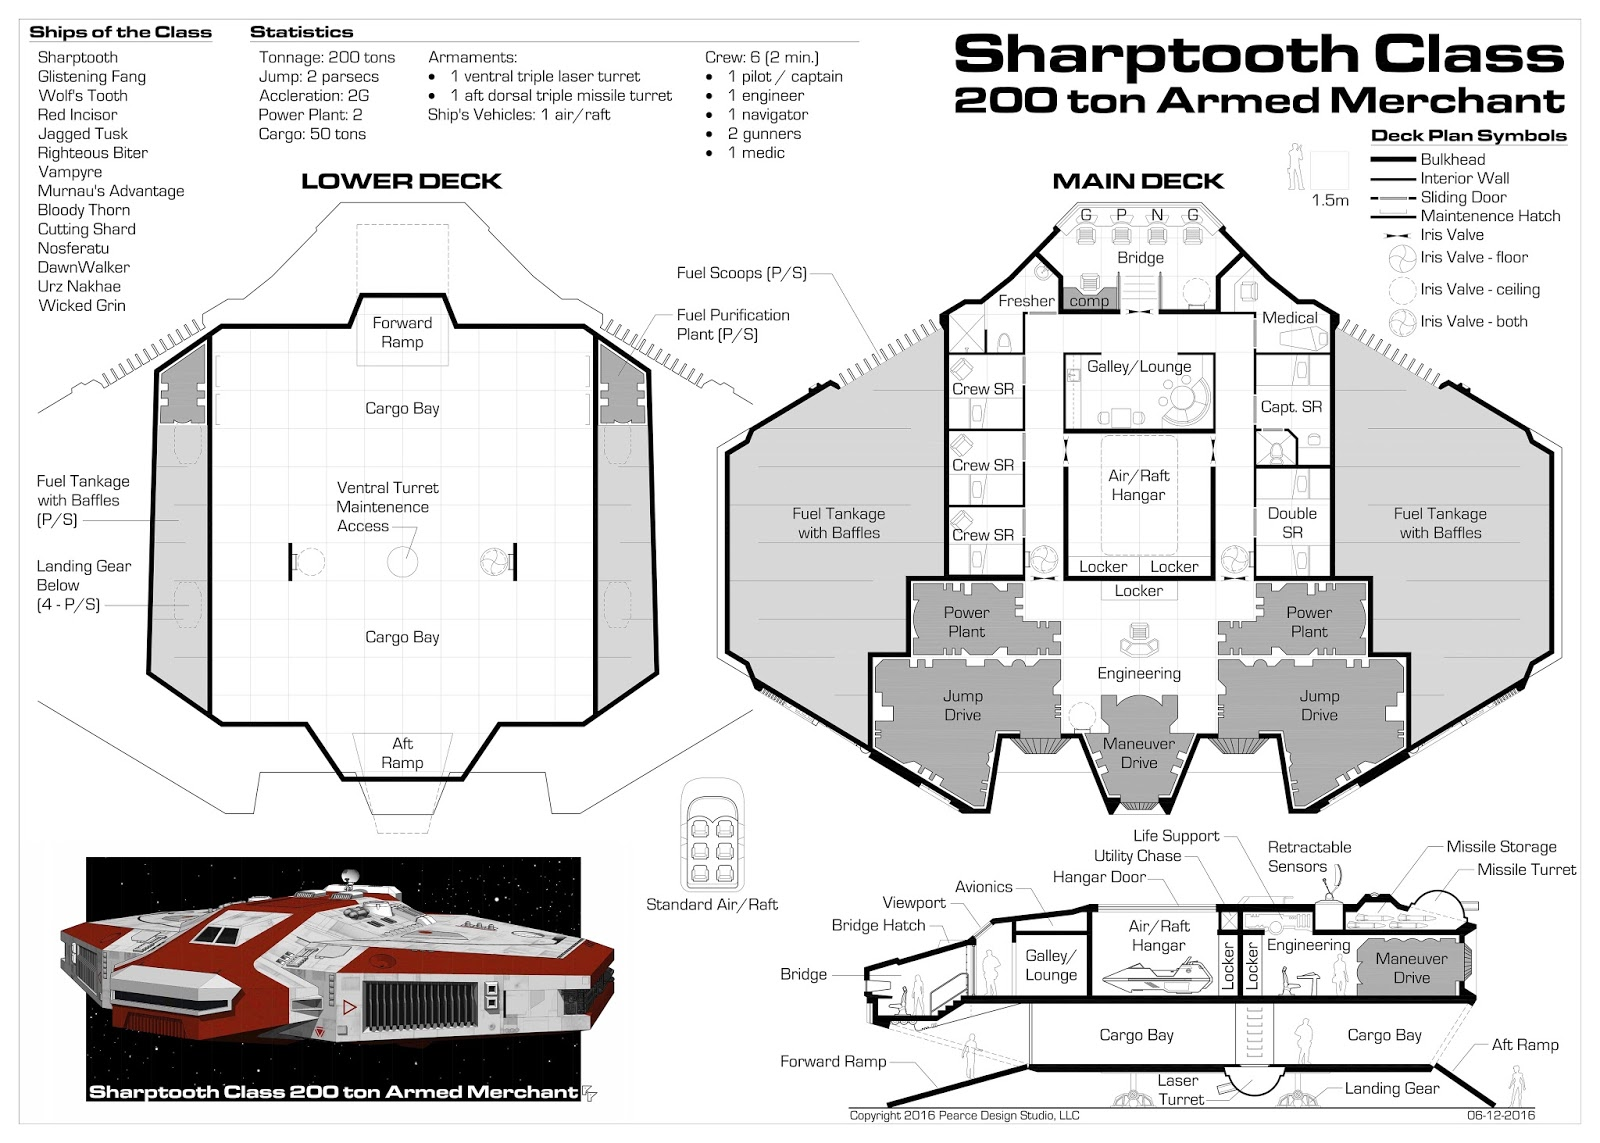 Yet another traveller blog deck plans starship 200 ton armed deck plans starship 200 ton armed merchant baanklon Images